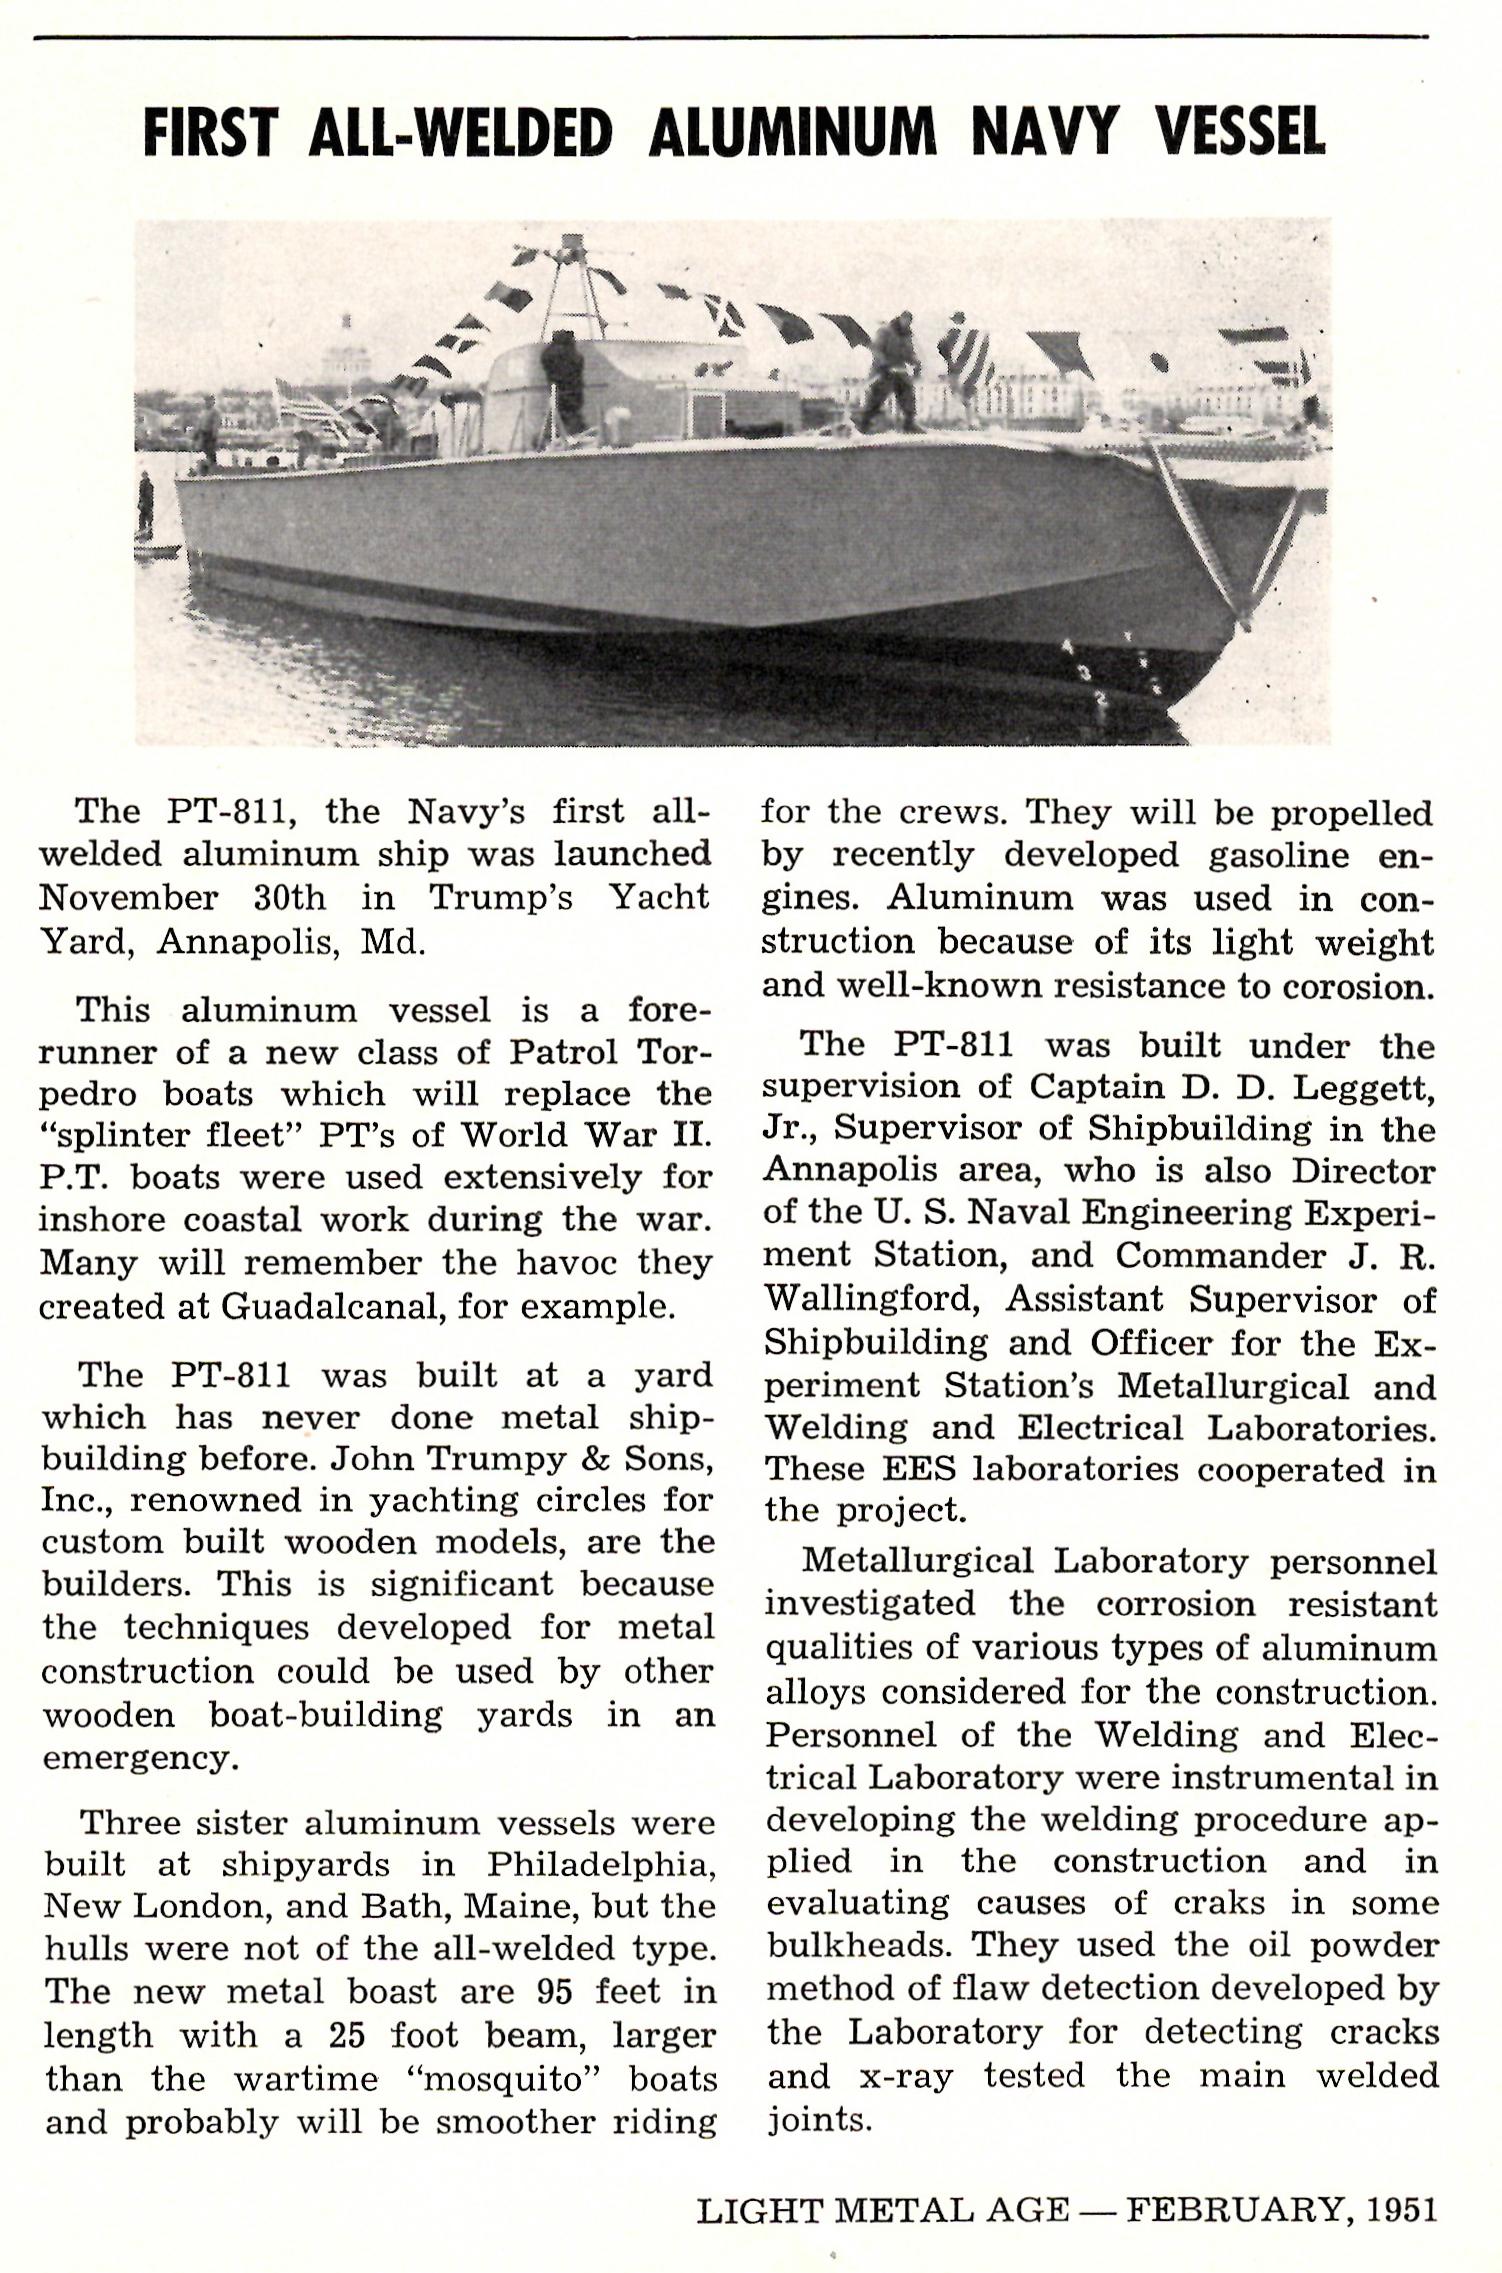 Light Metal Age, February 1951